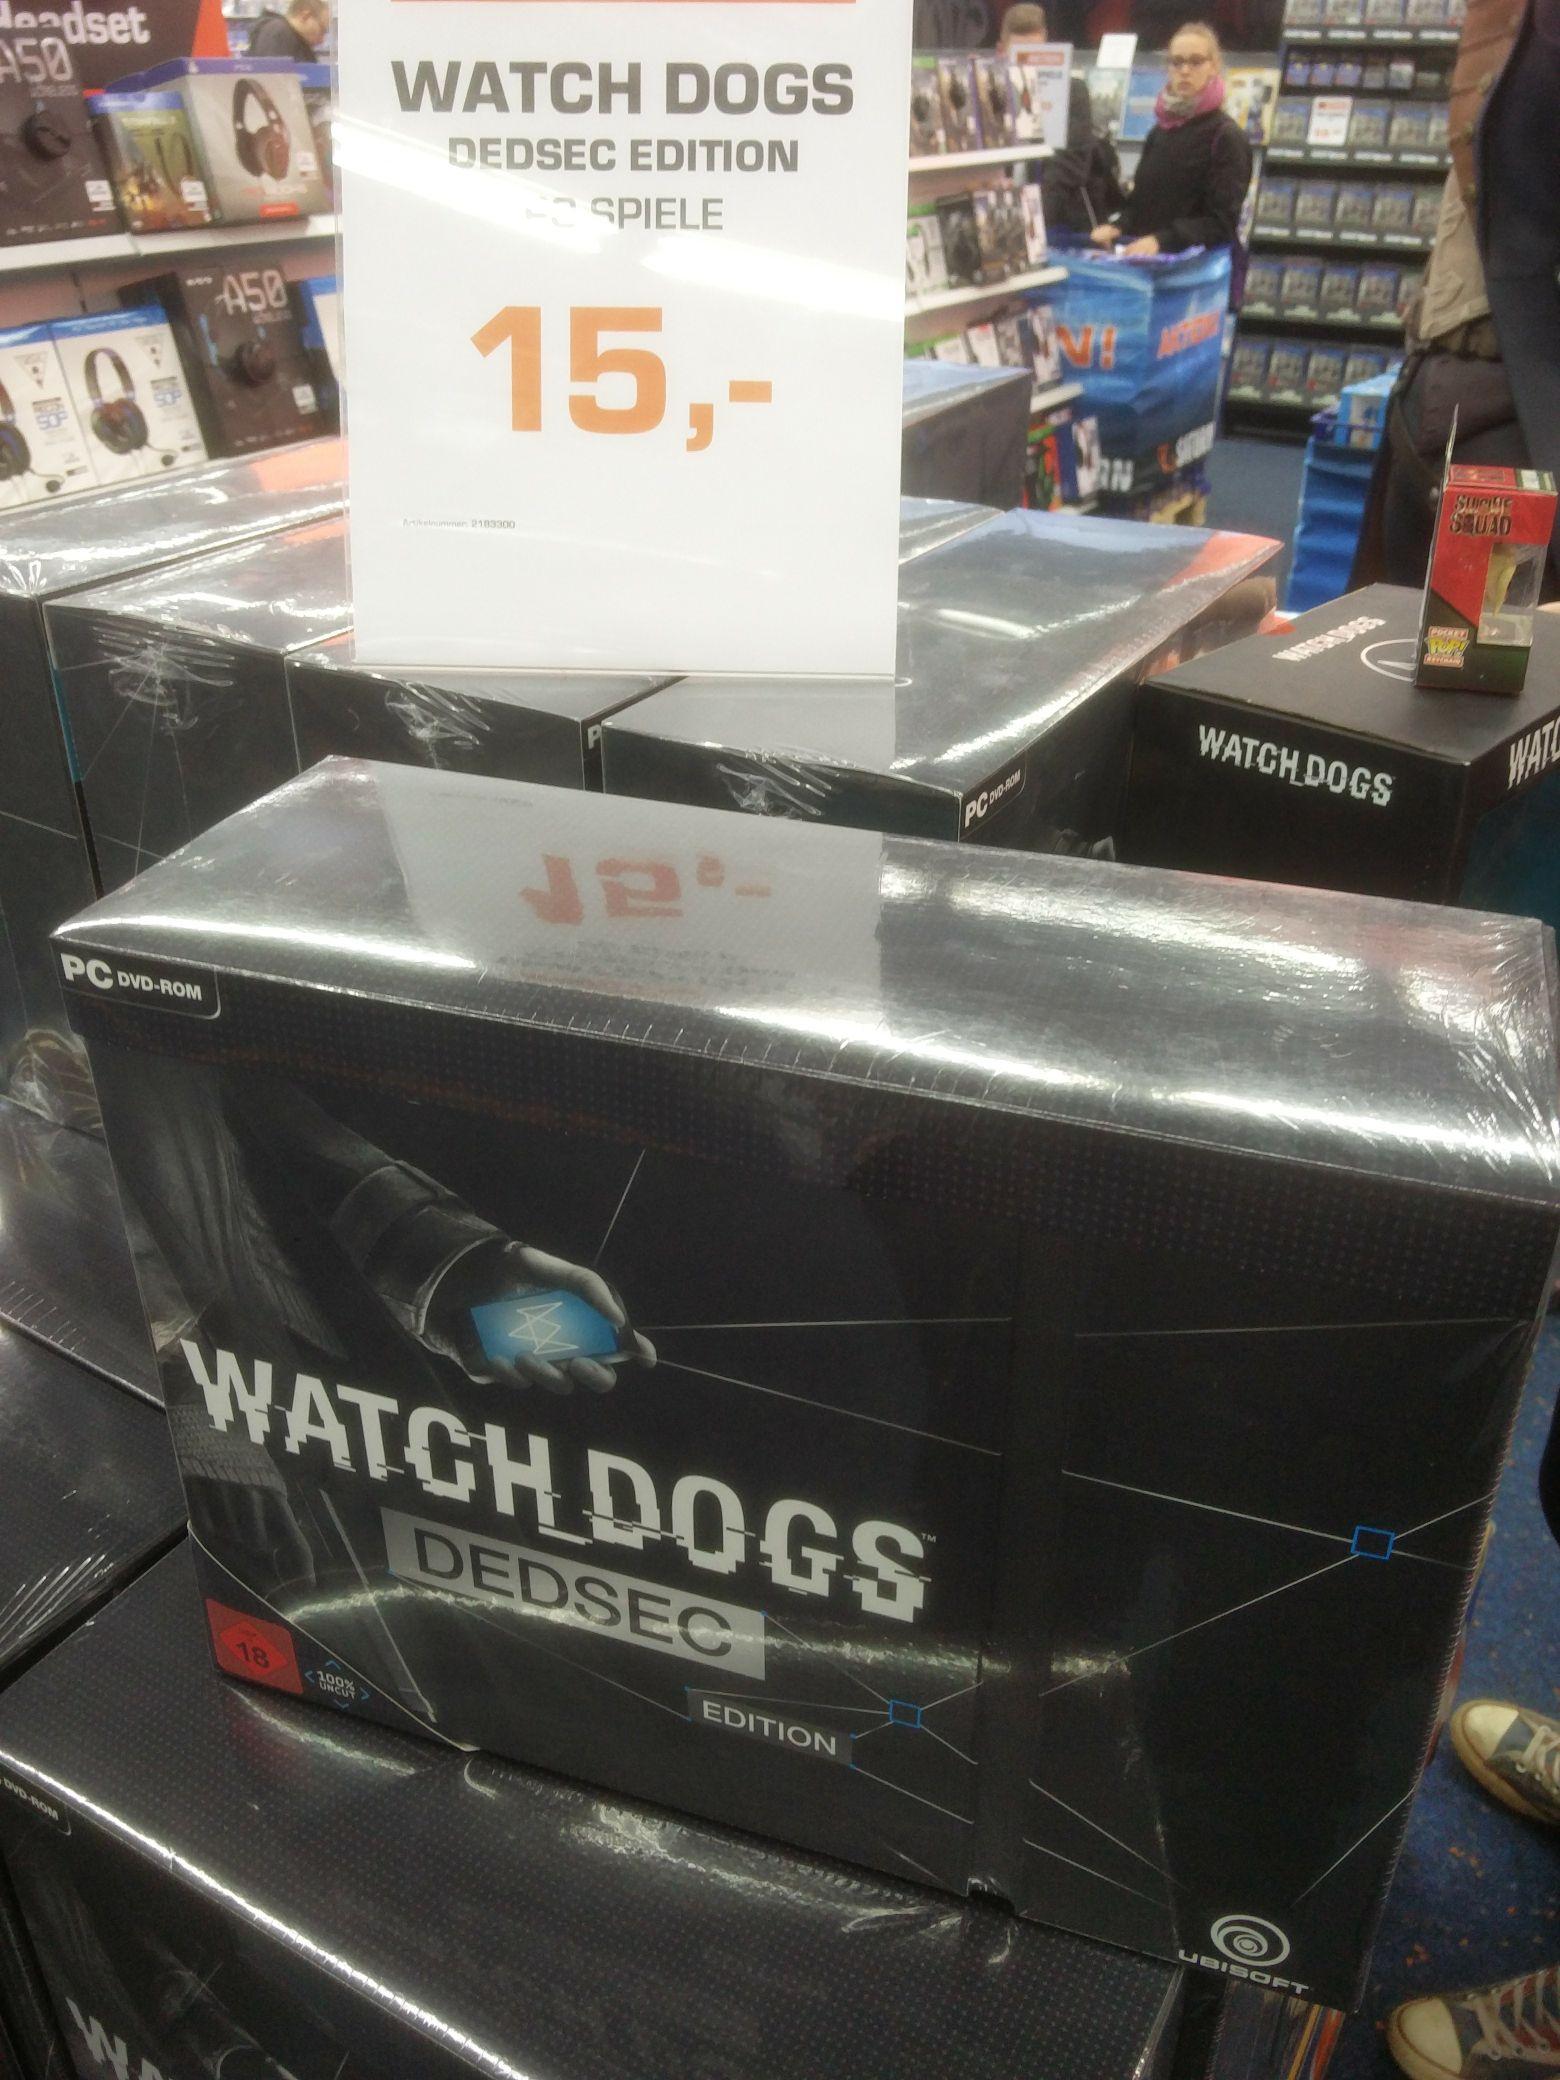 [PC] Watch Dogs - Dedsec Edition - Saturn Berlin Alexanderplatz